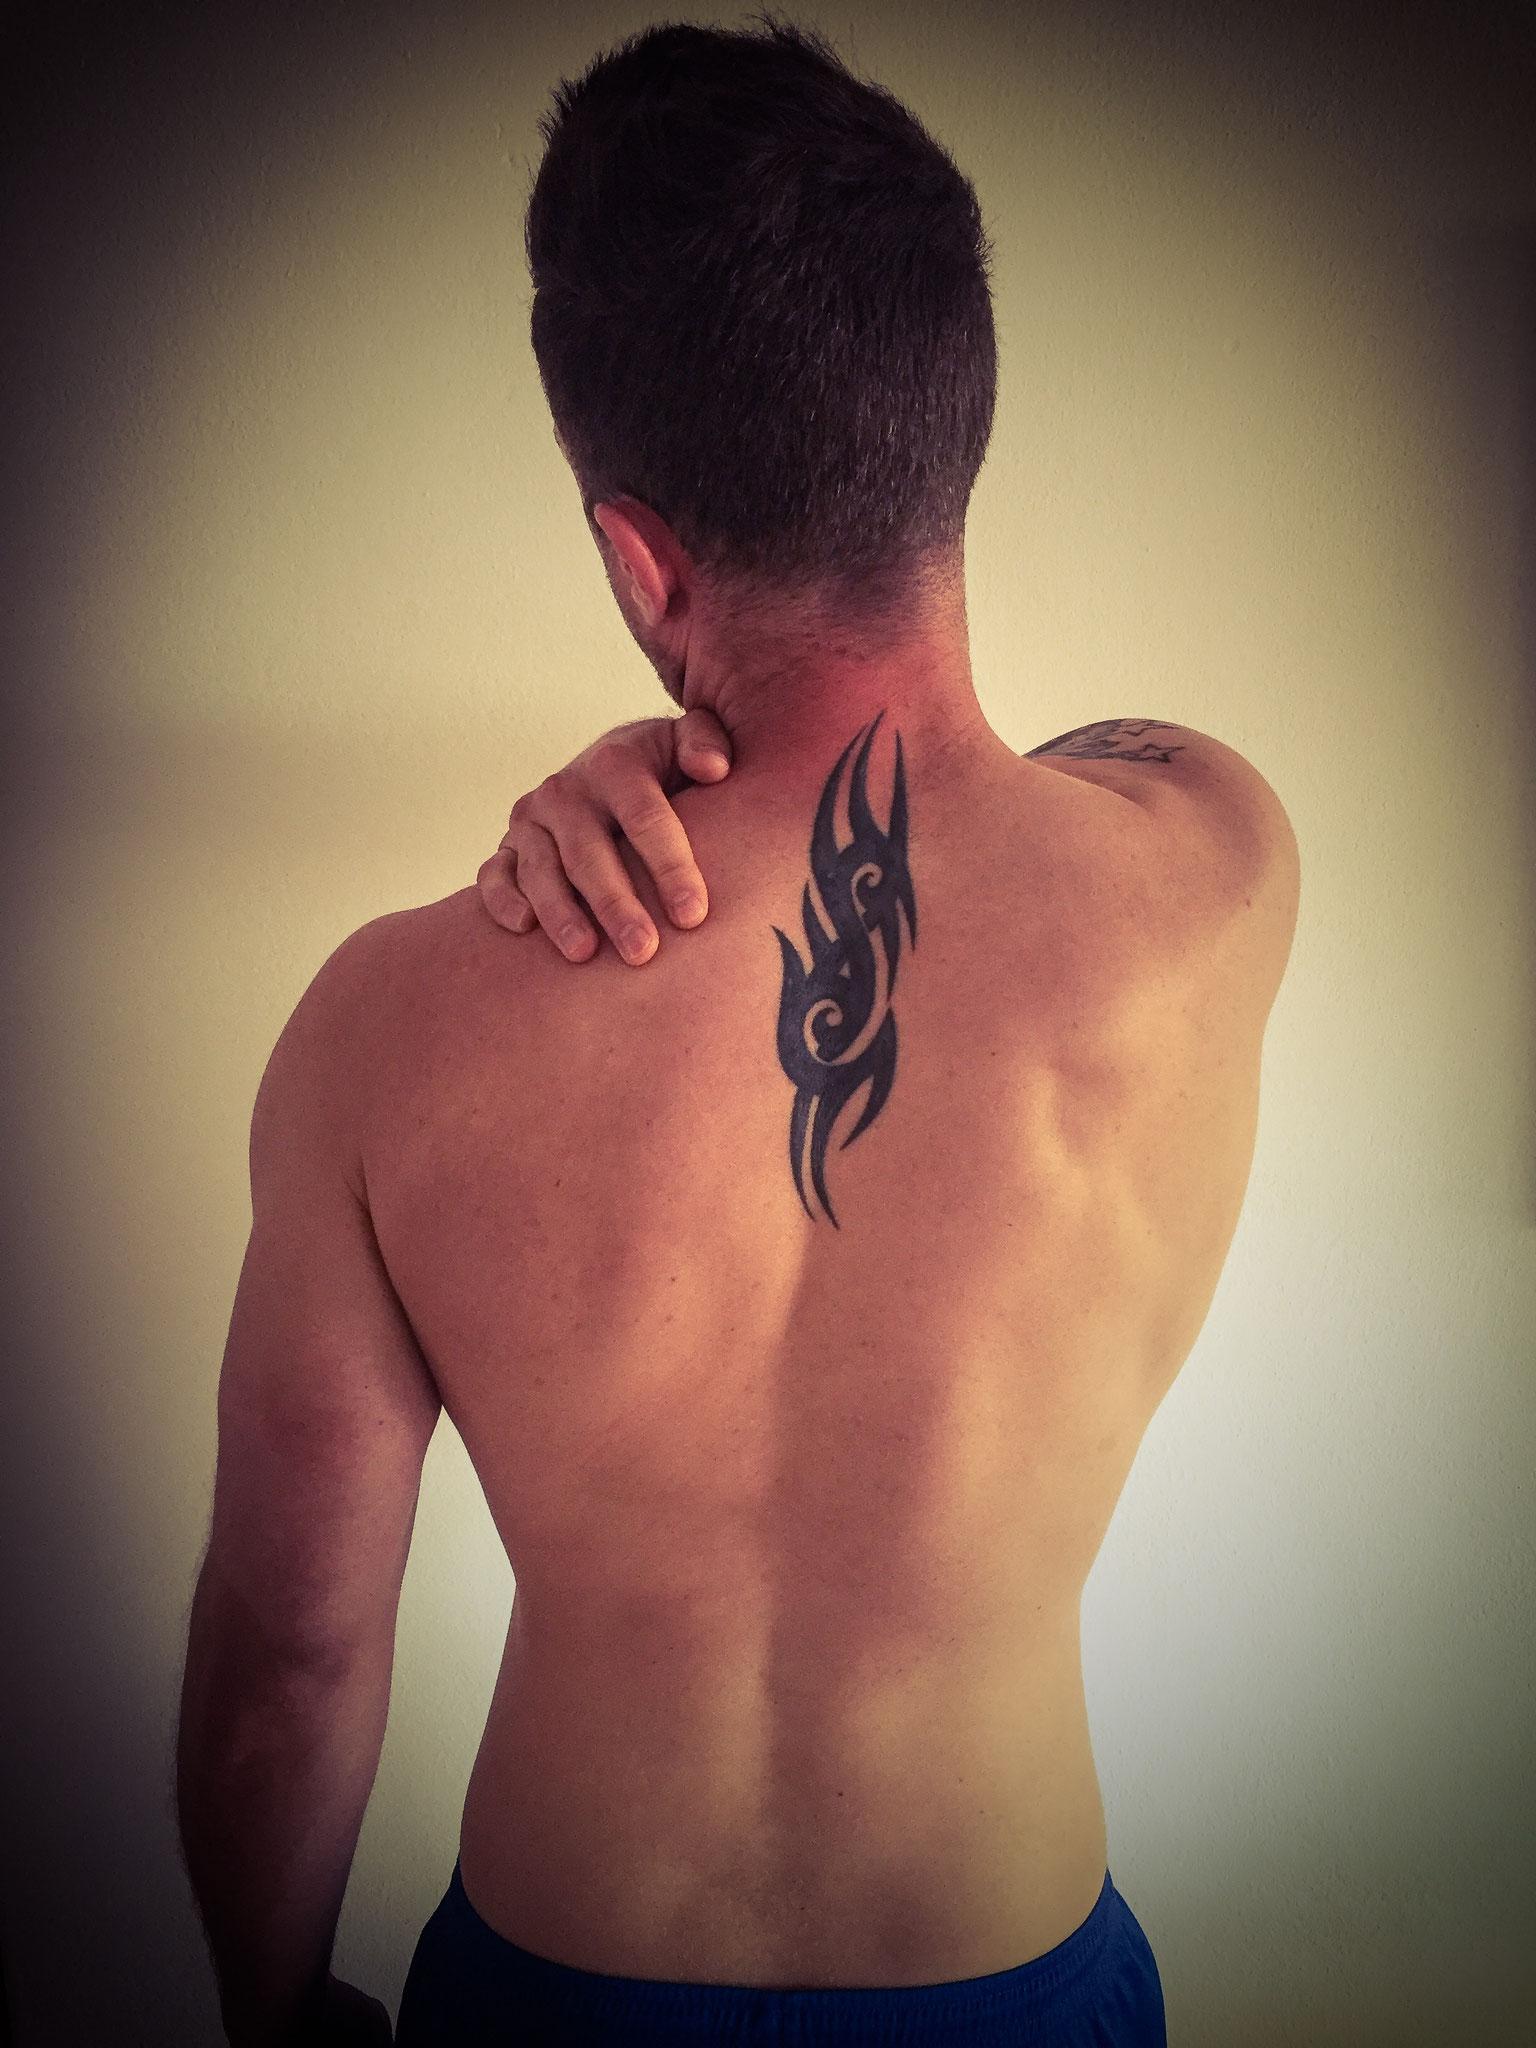 Der Rücken schmerzt?